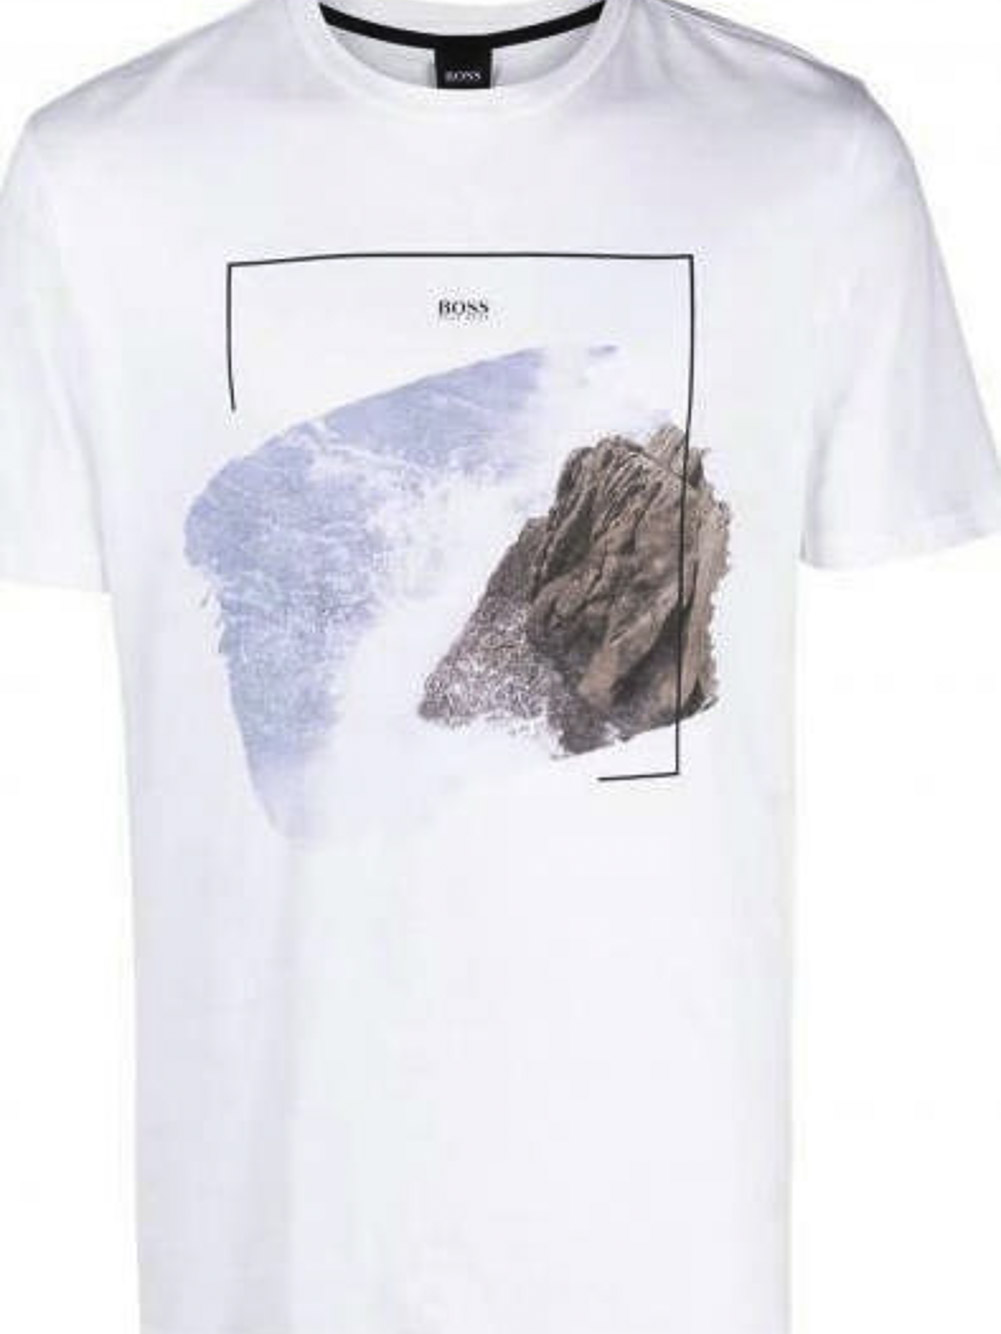 BOSS Μπλούζα t-shirt 50450898-100 ΕΚΡΟΥ